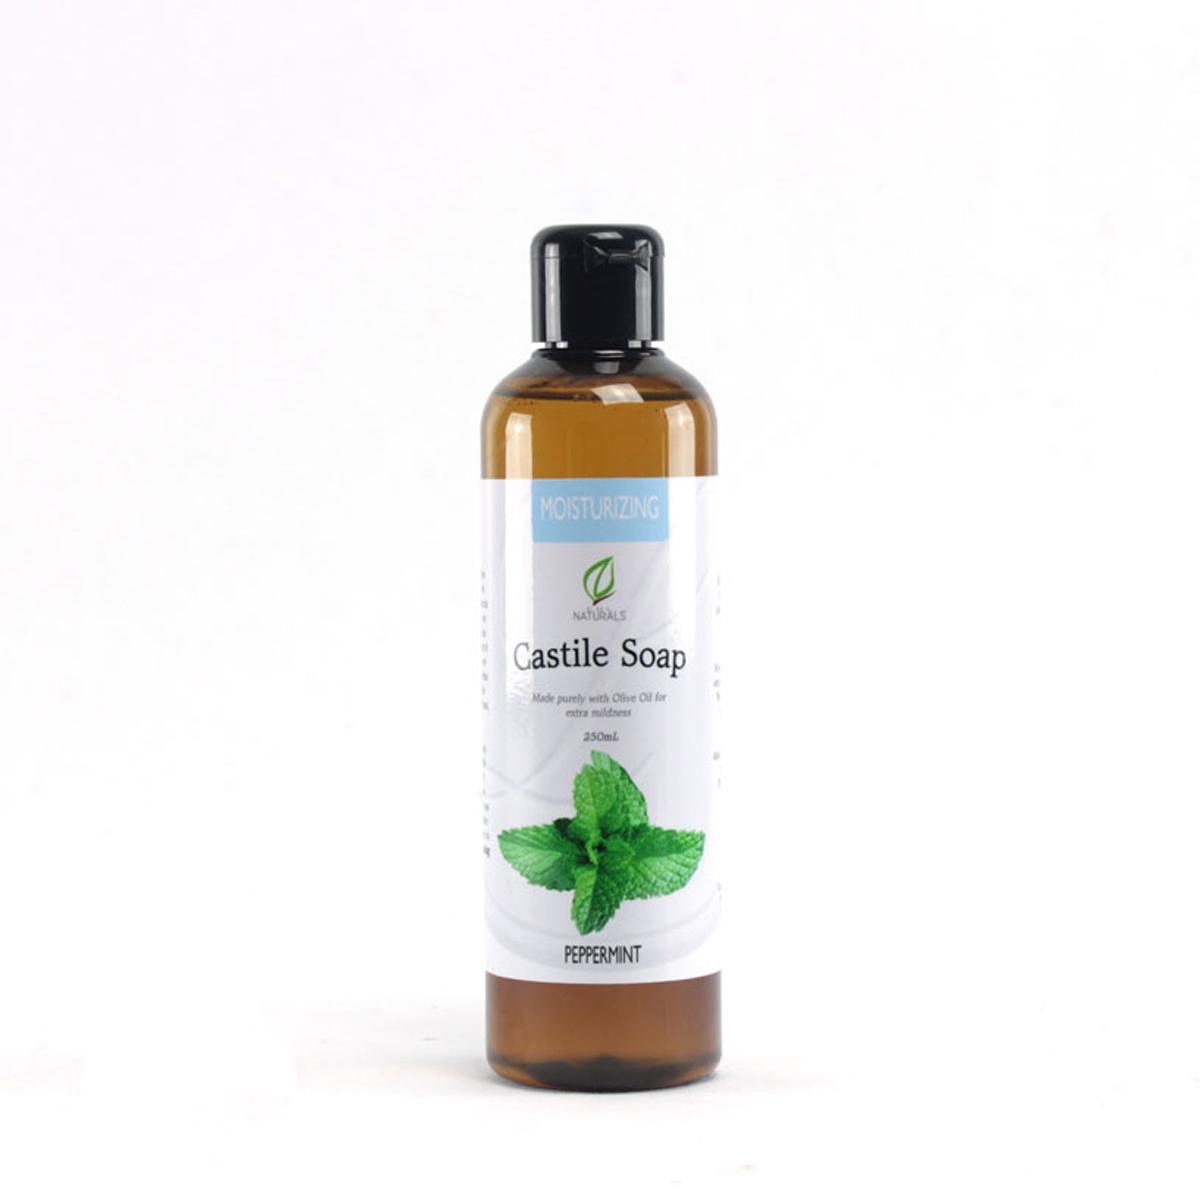 Peppermint Moisturizing Castile Soap